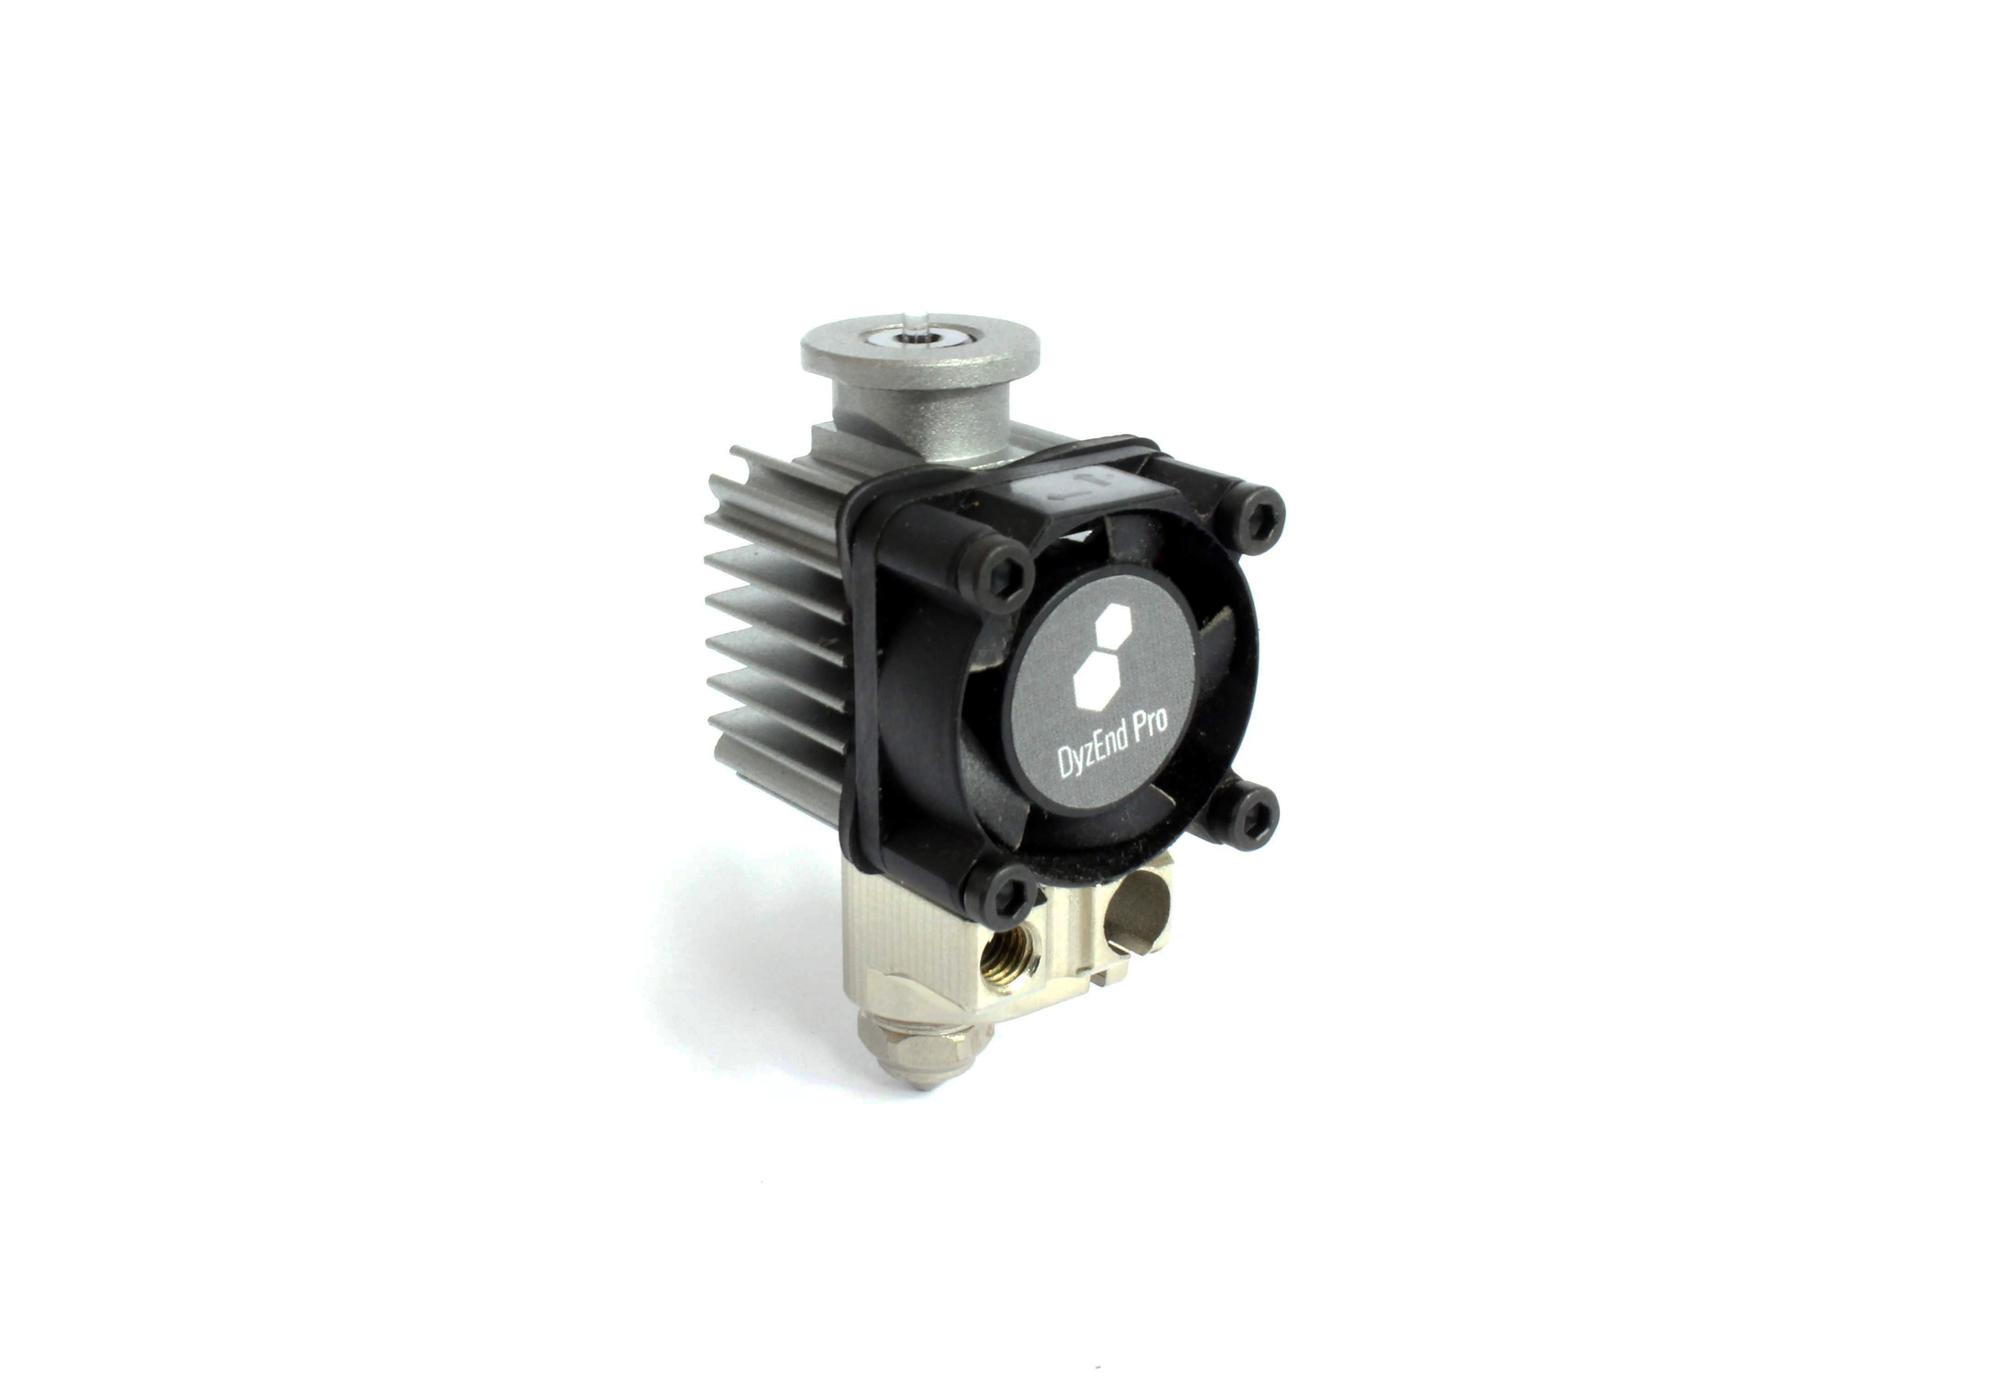 Dyze - DyzEnd Pro 500°C Hotend (24V / 40W / 0.4mm / 1.75mm)